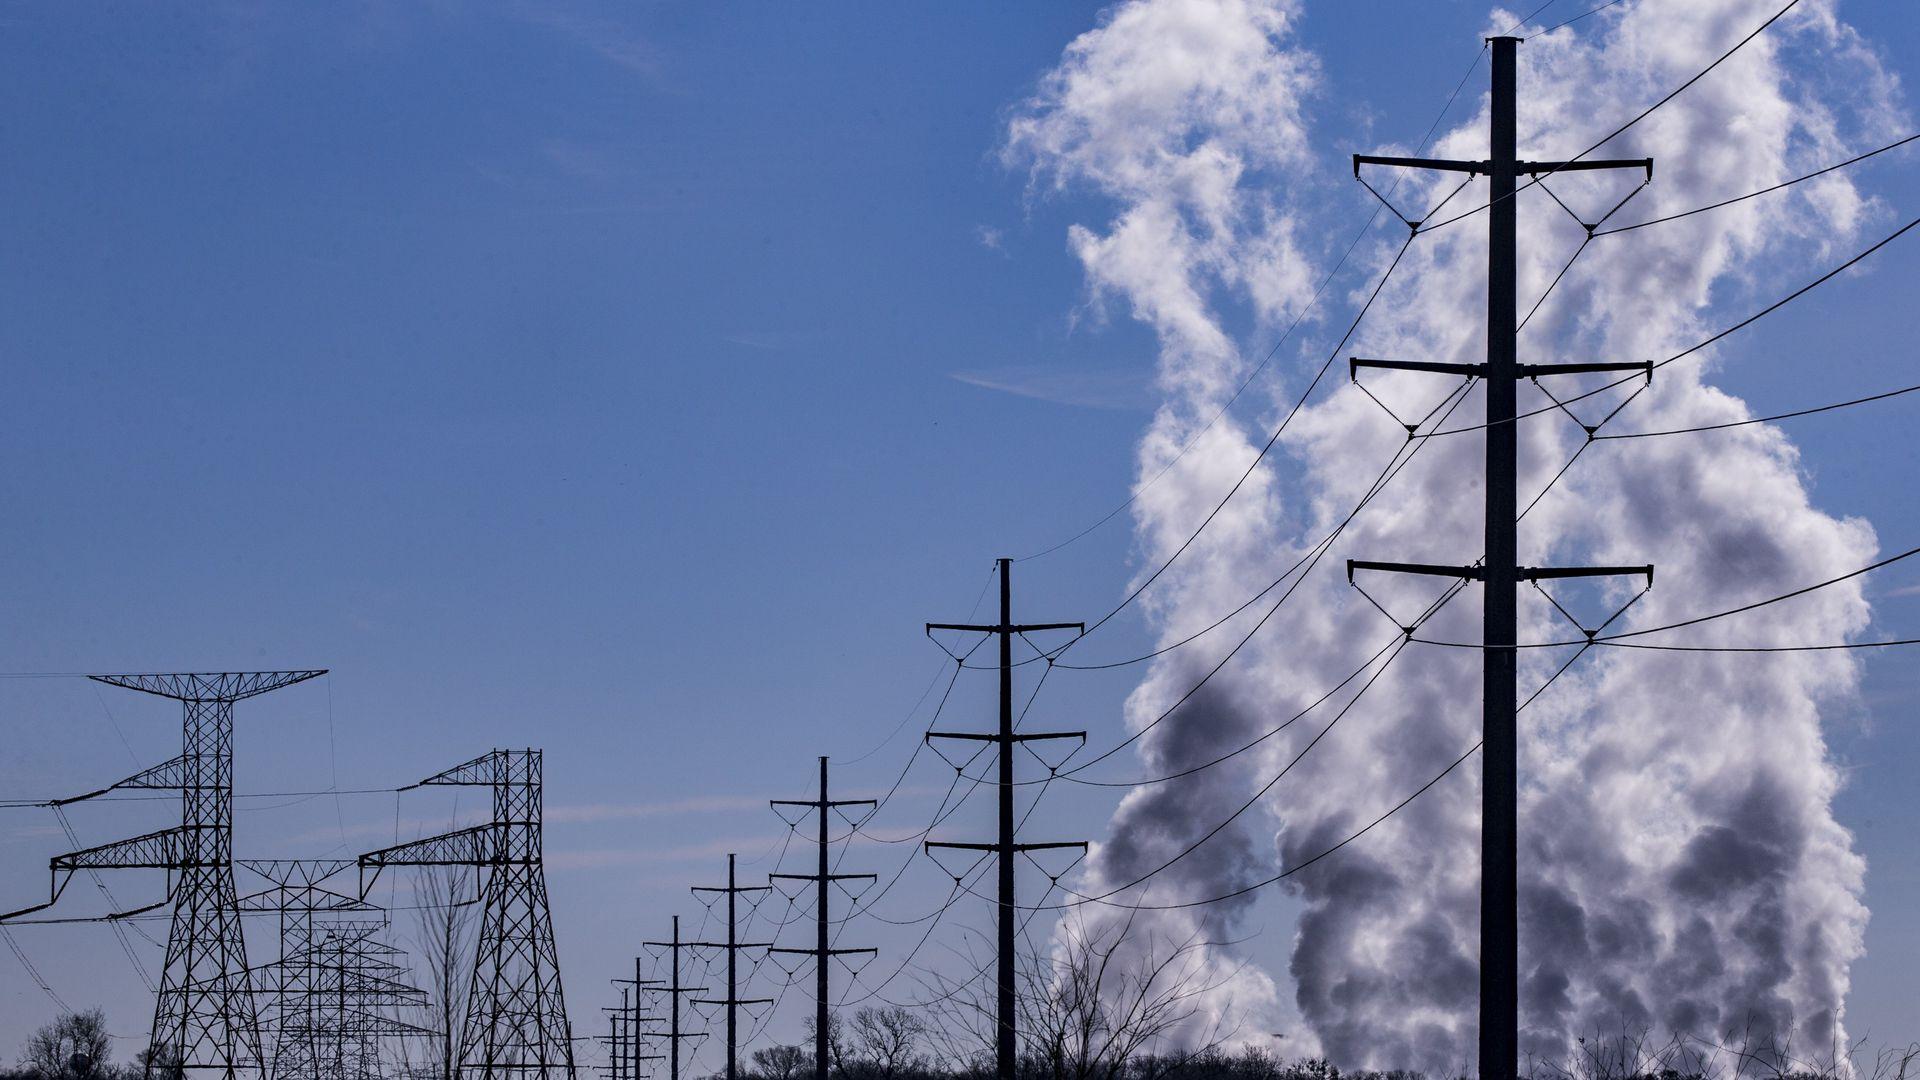 Smoke billows near power lines